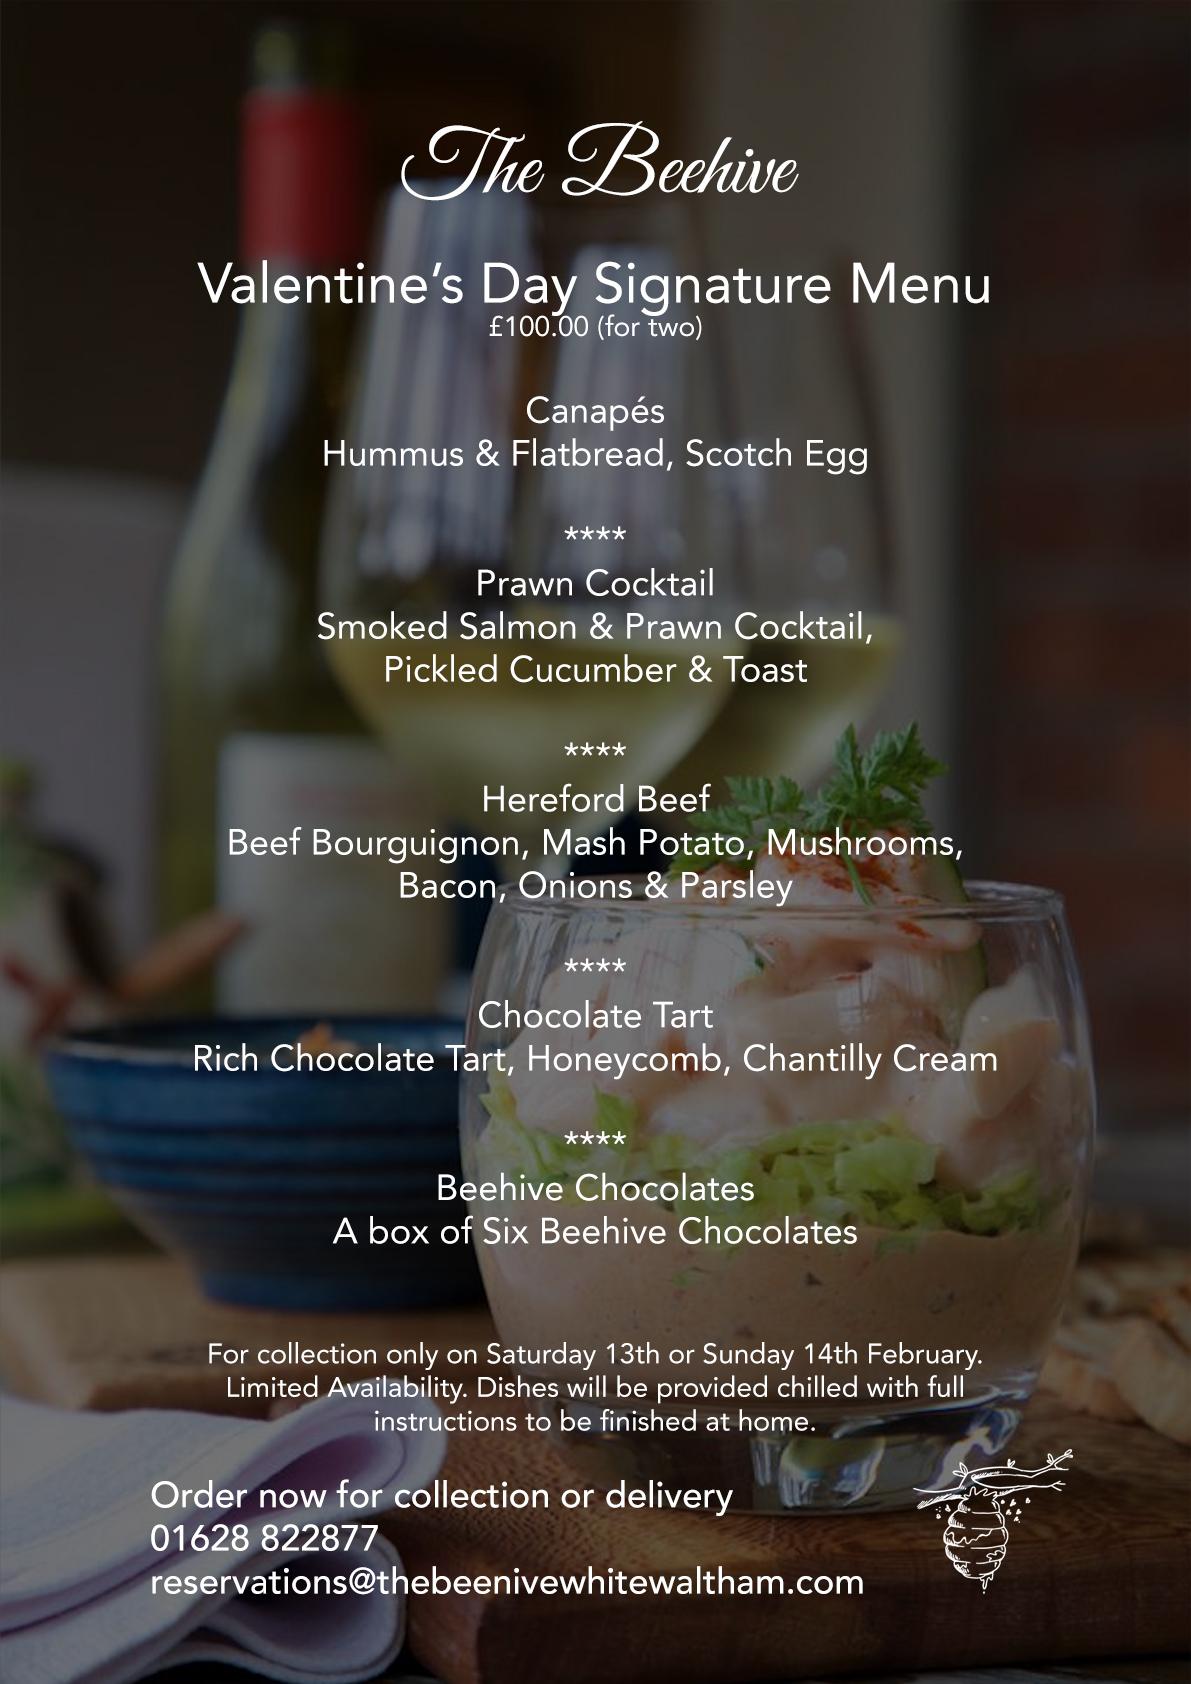 Valentine's Day Signature Menu